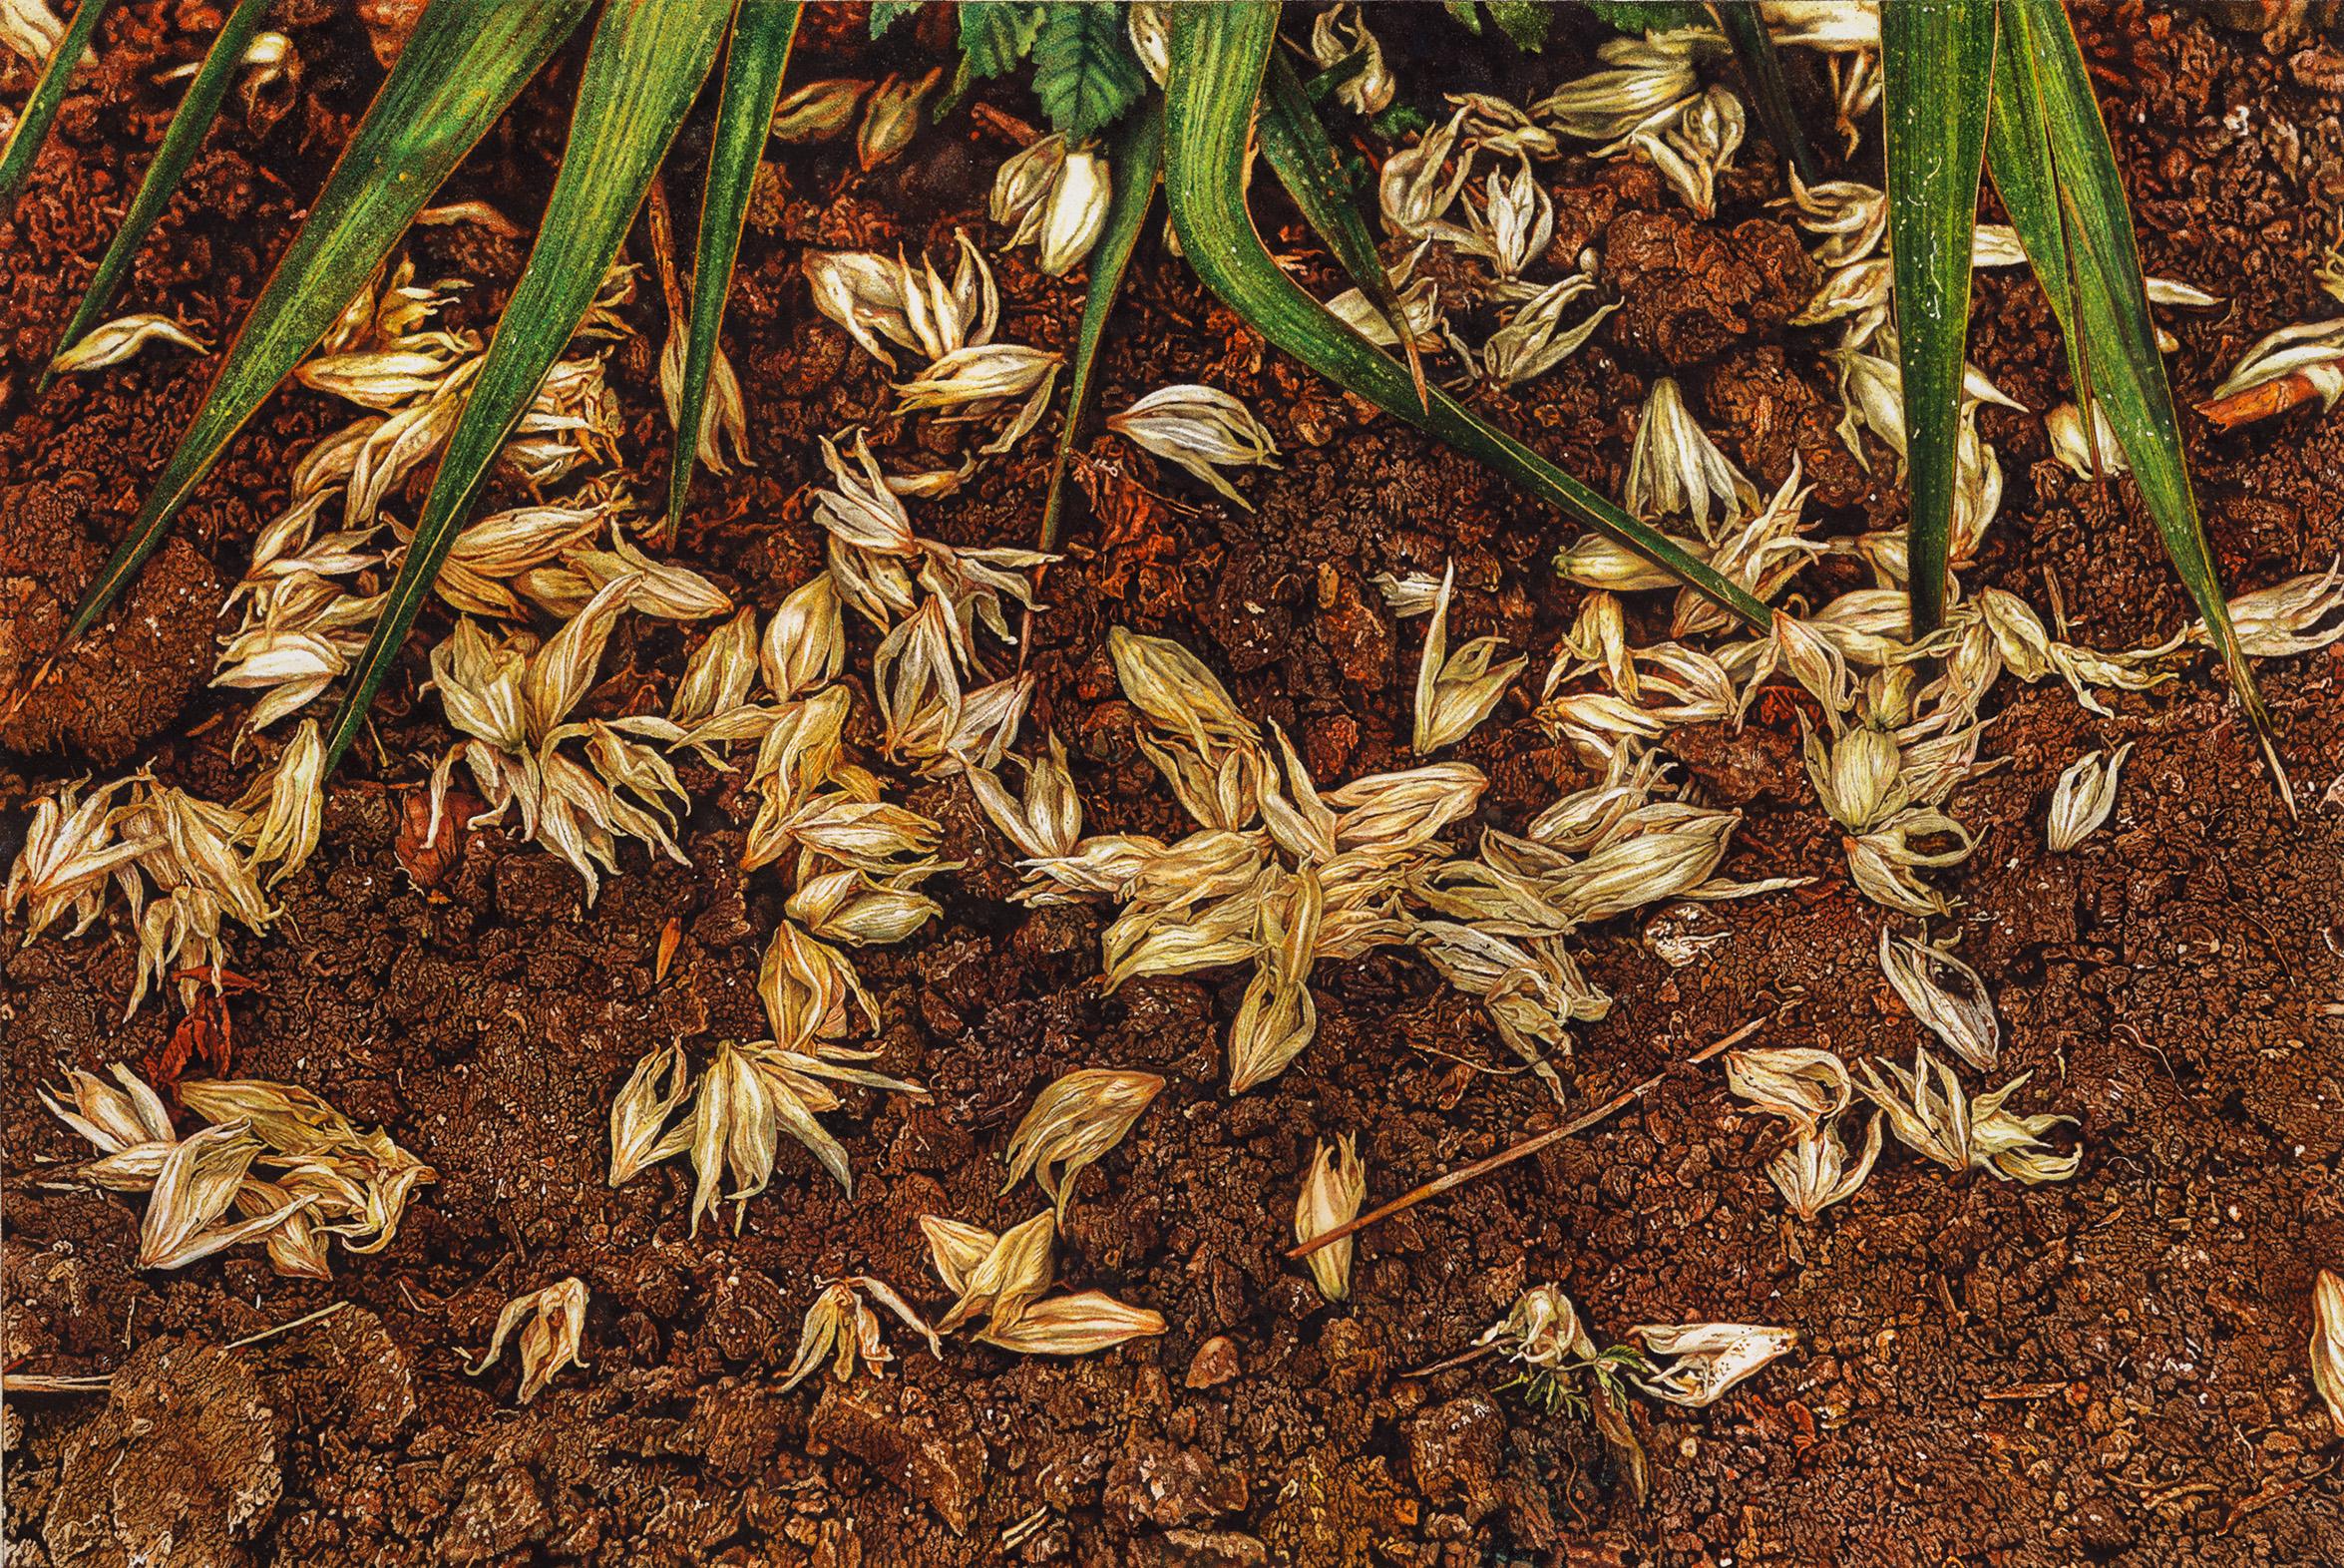 Nadija Kudryavtseva, Fallen petals of yucca, Watercolour and acrylic on paper, 77 x 52,5 сm.,  https://nkudryavtseva.wixsite.com/nadijan-art